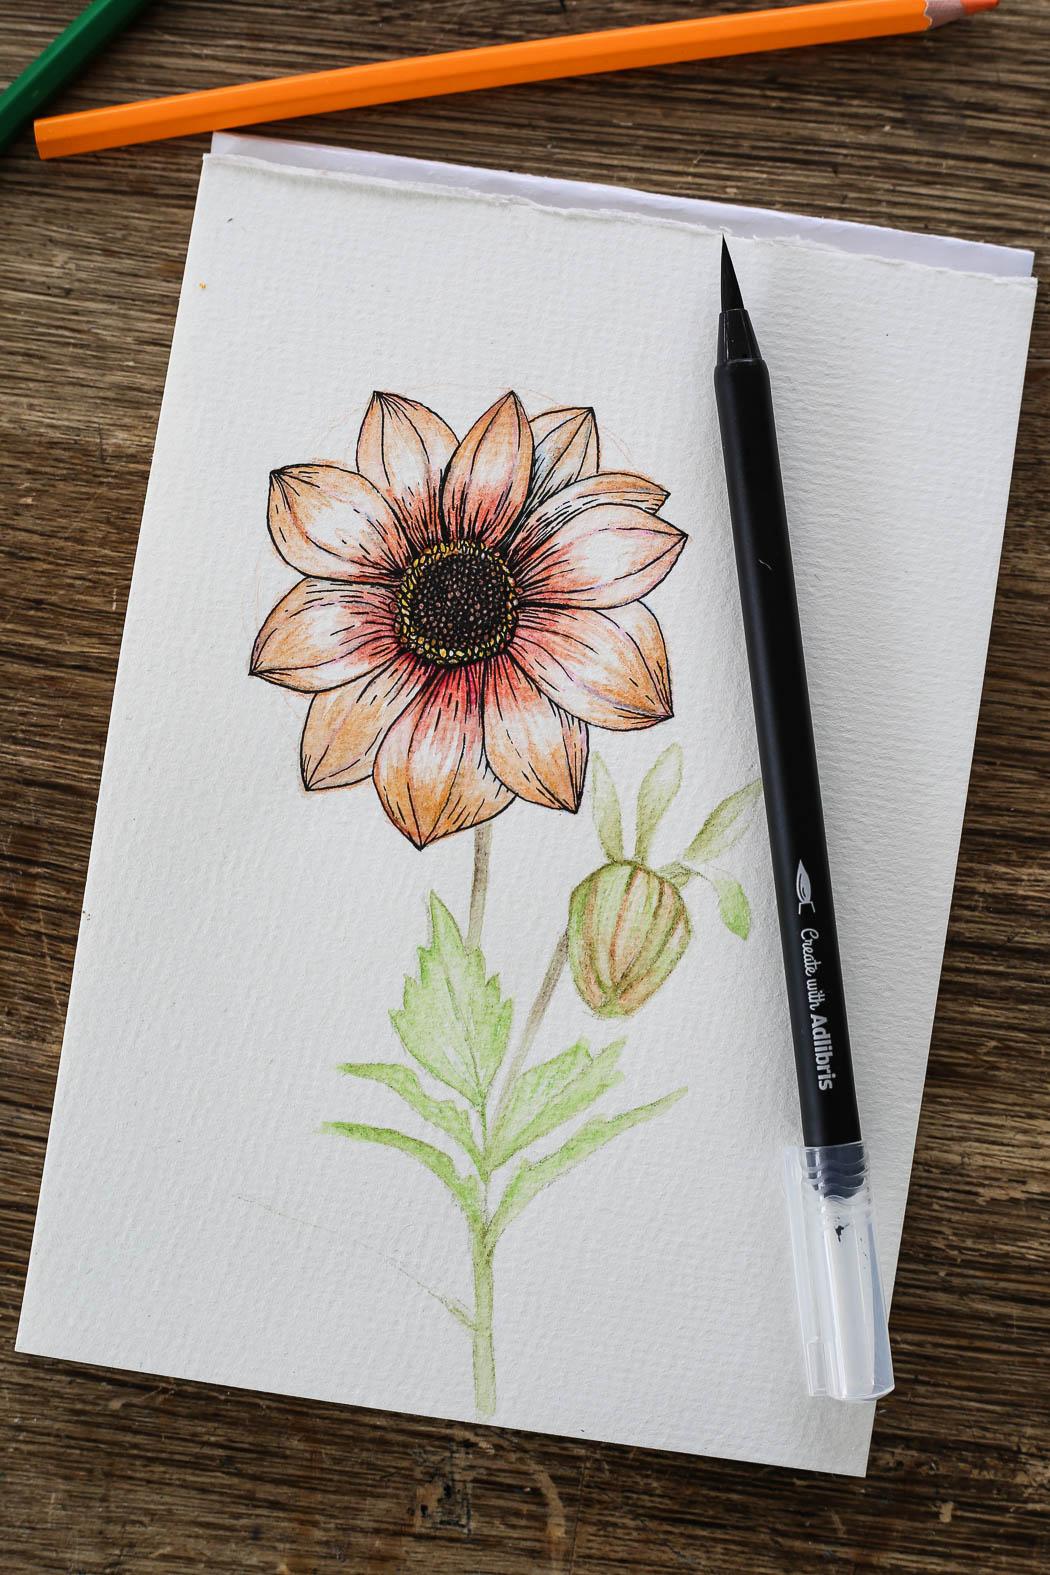 HannaWendelbo_akvarellpennor_AdLibris-23.jpg